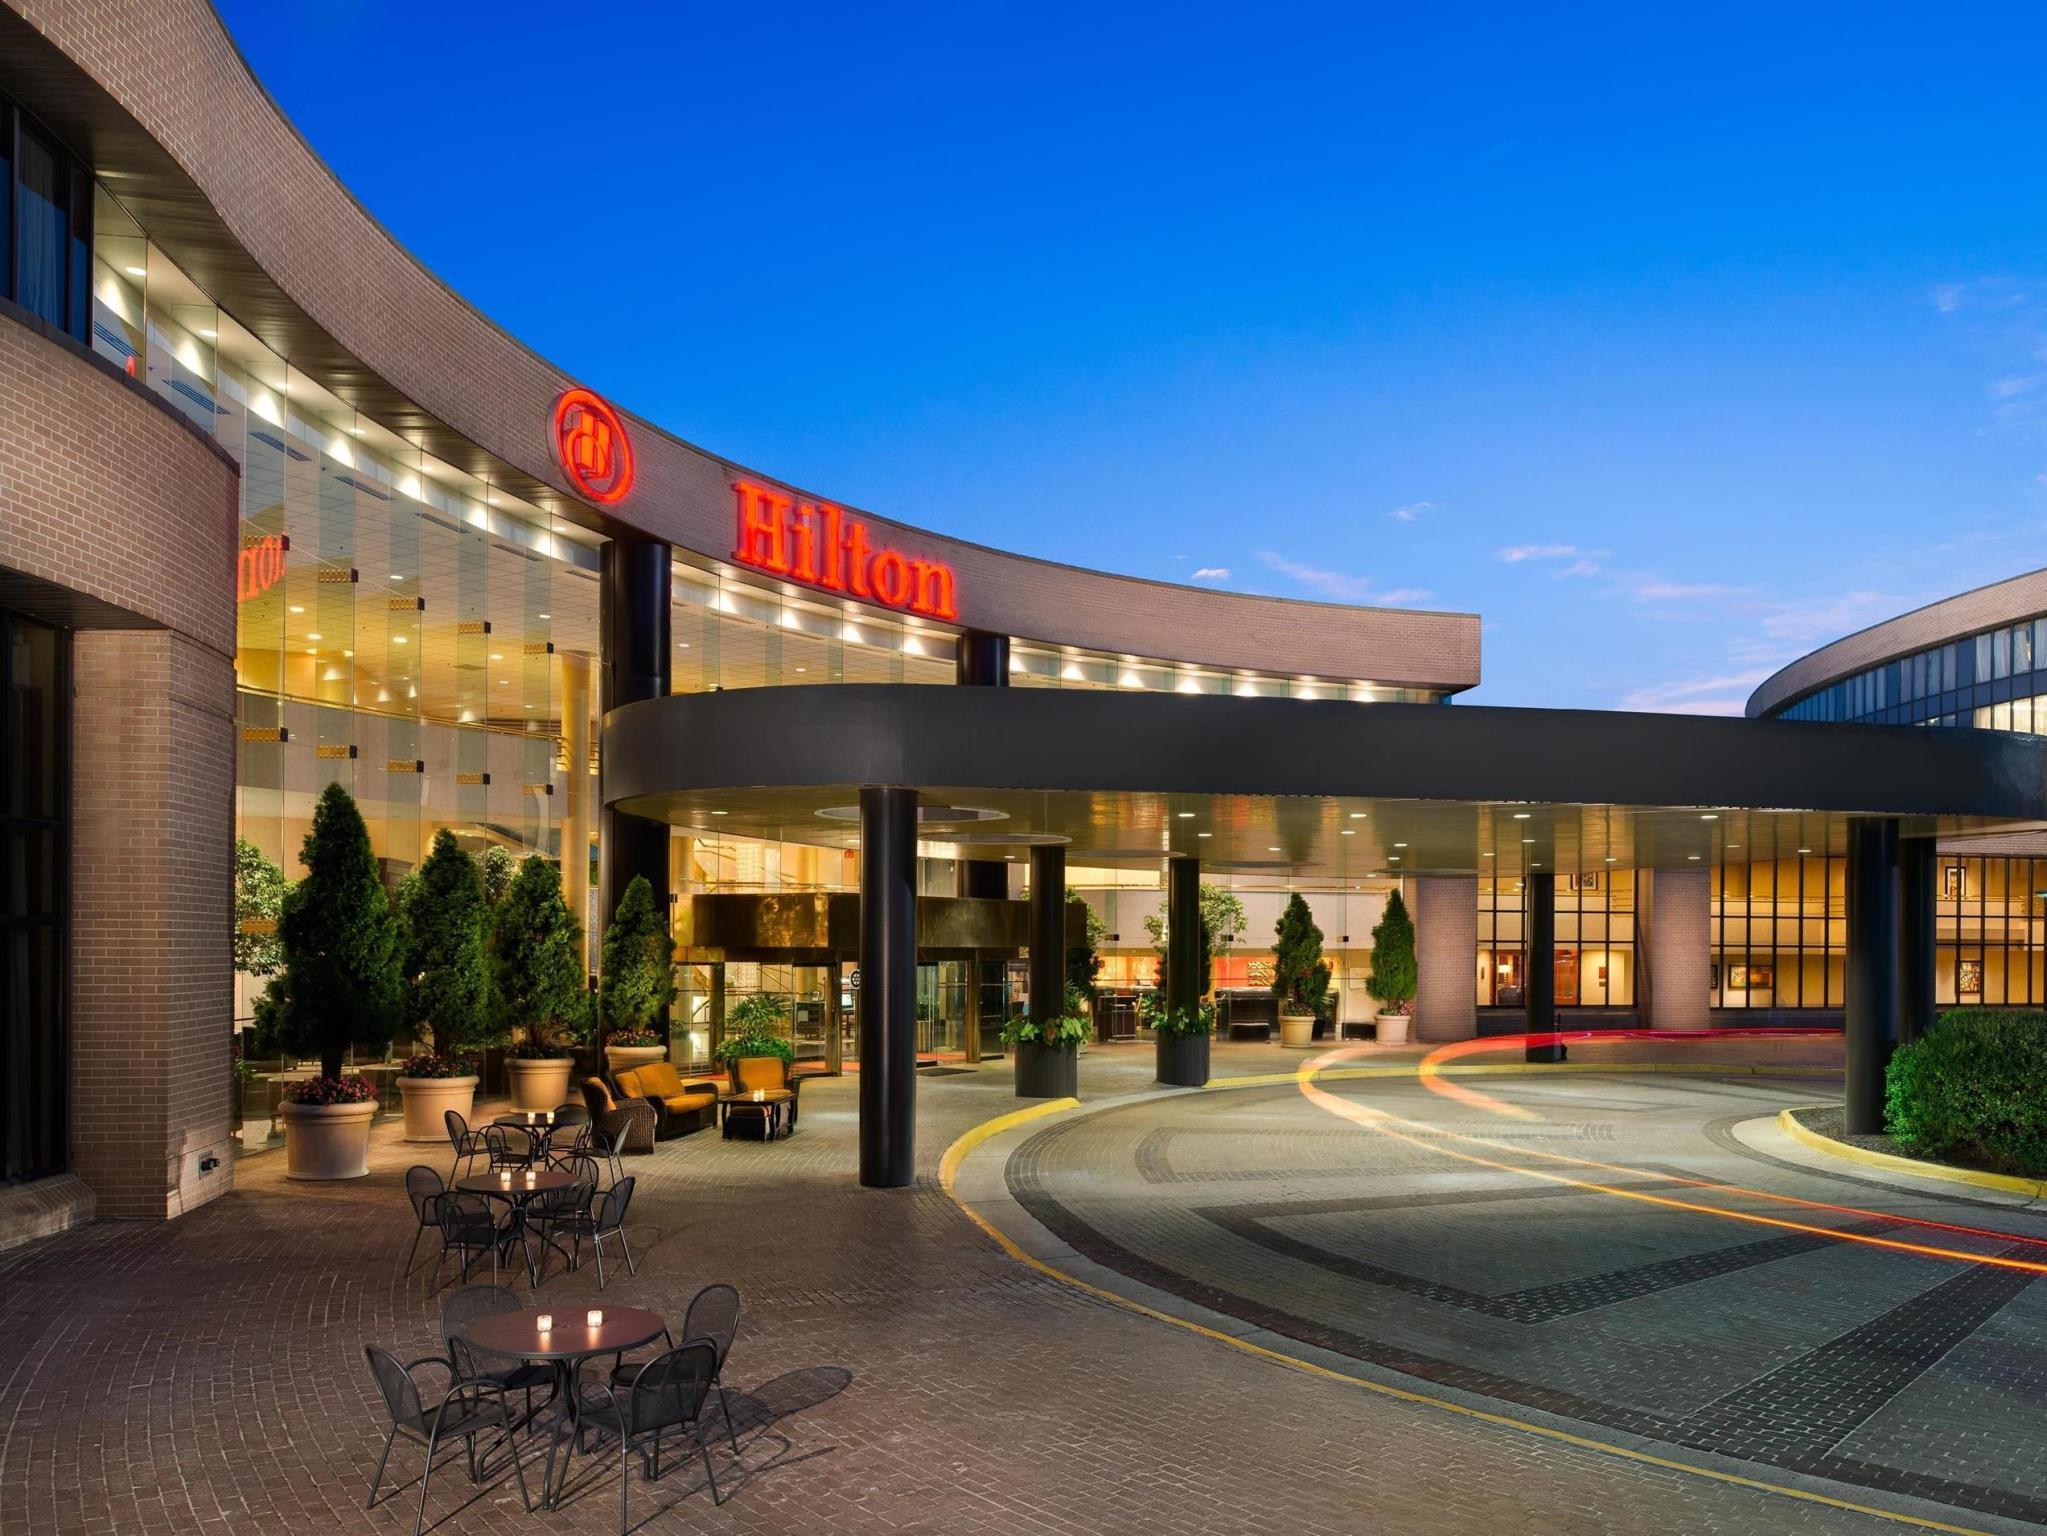 Hilton Washington Dulles Hotel